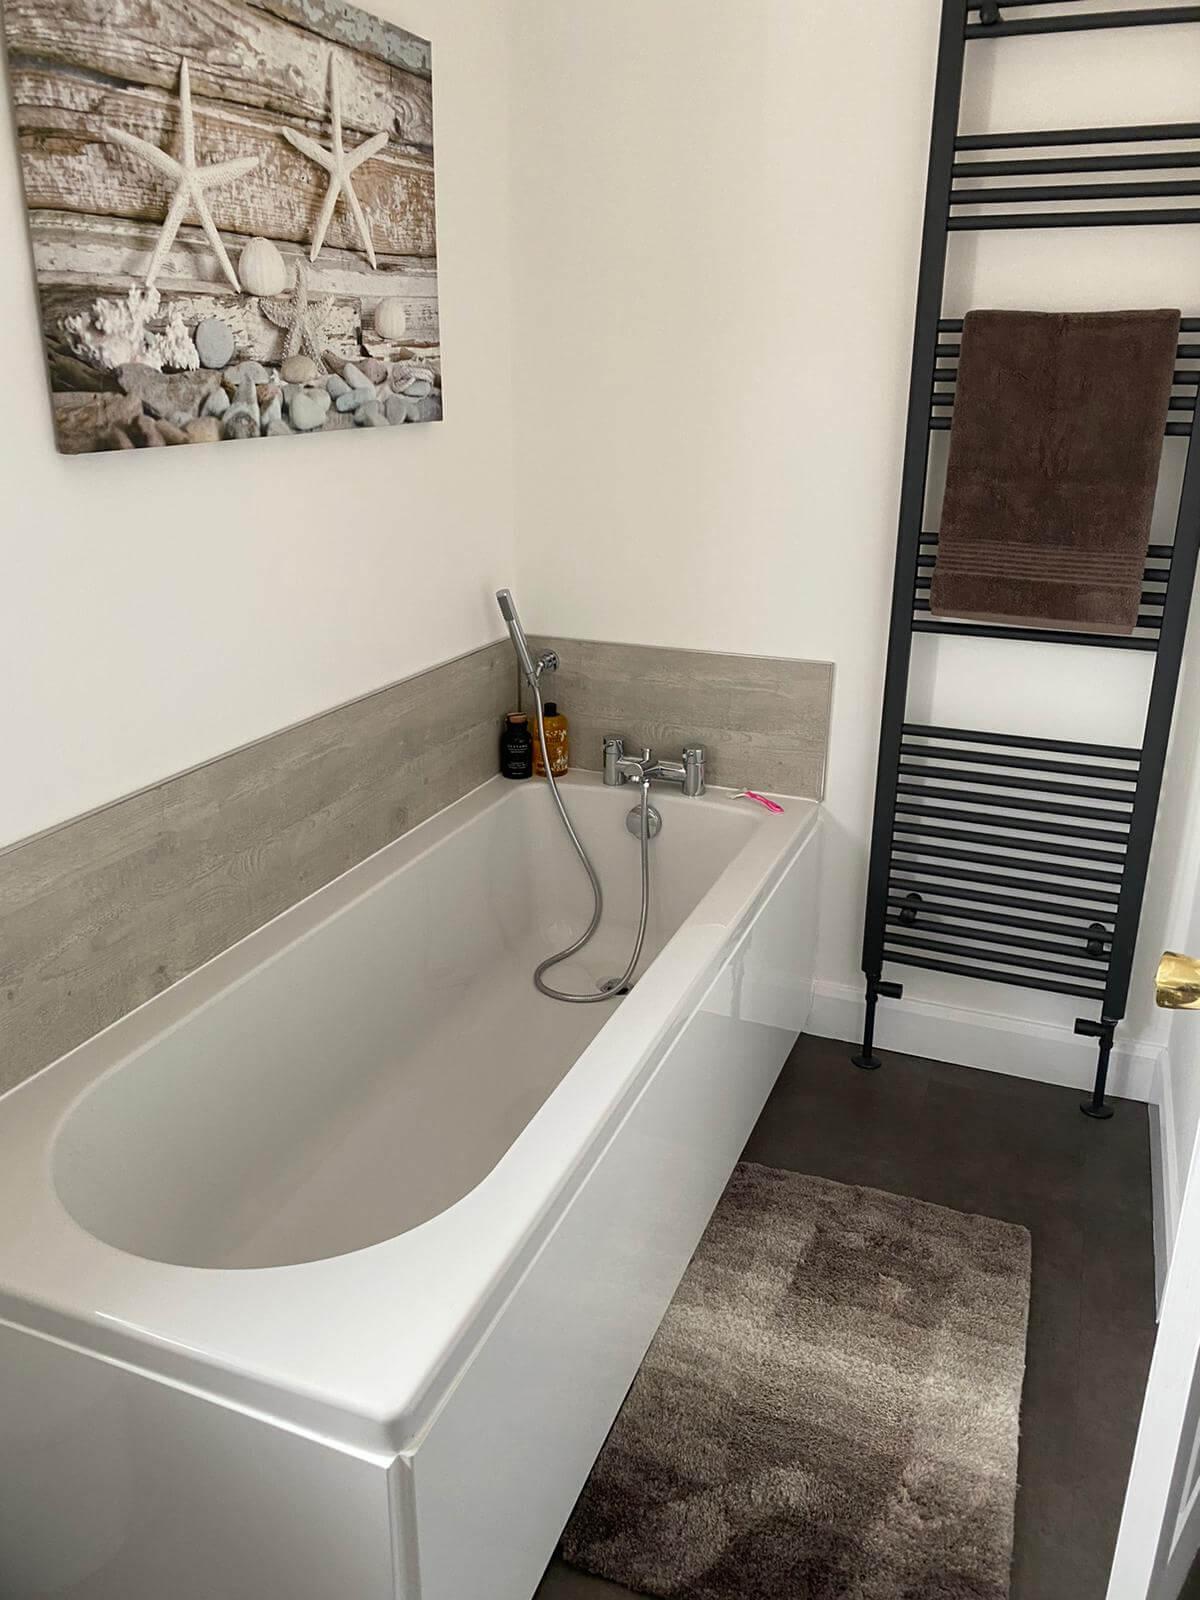 New Bathroom Bathtub